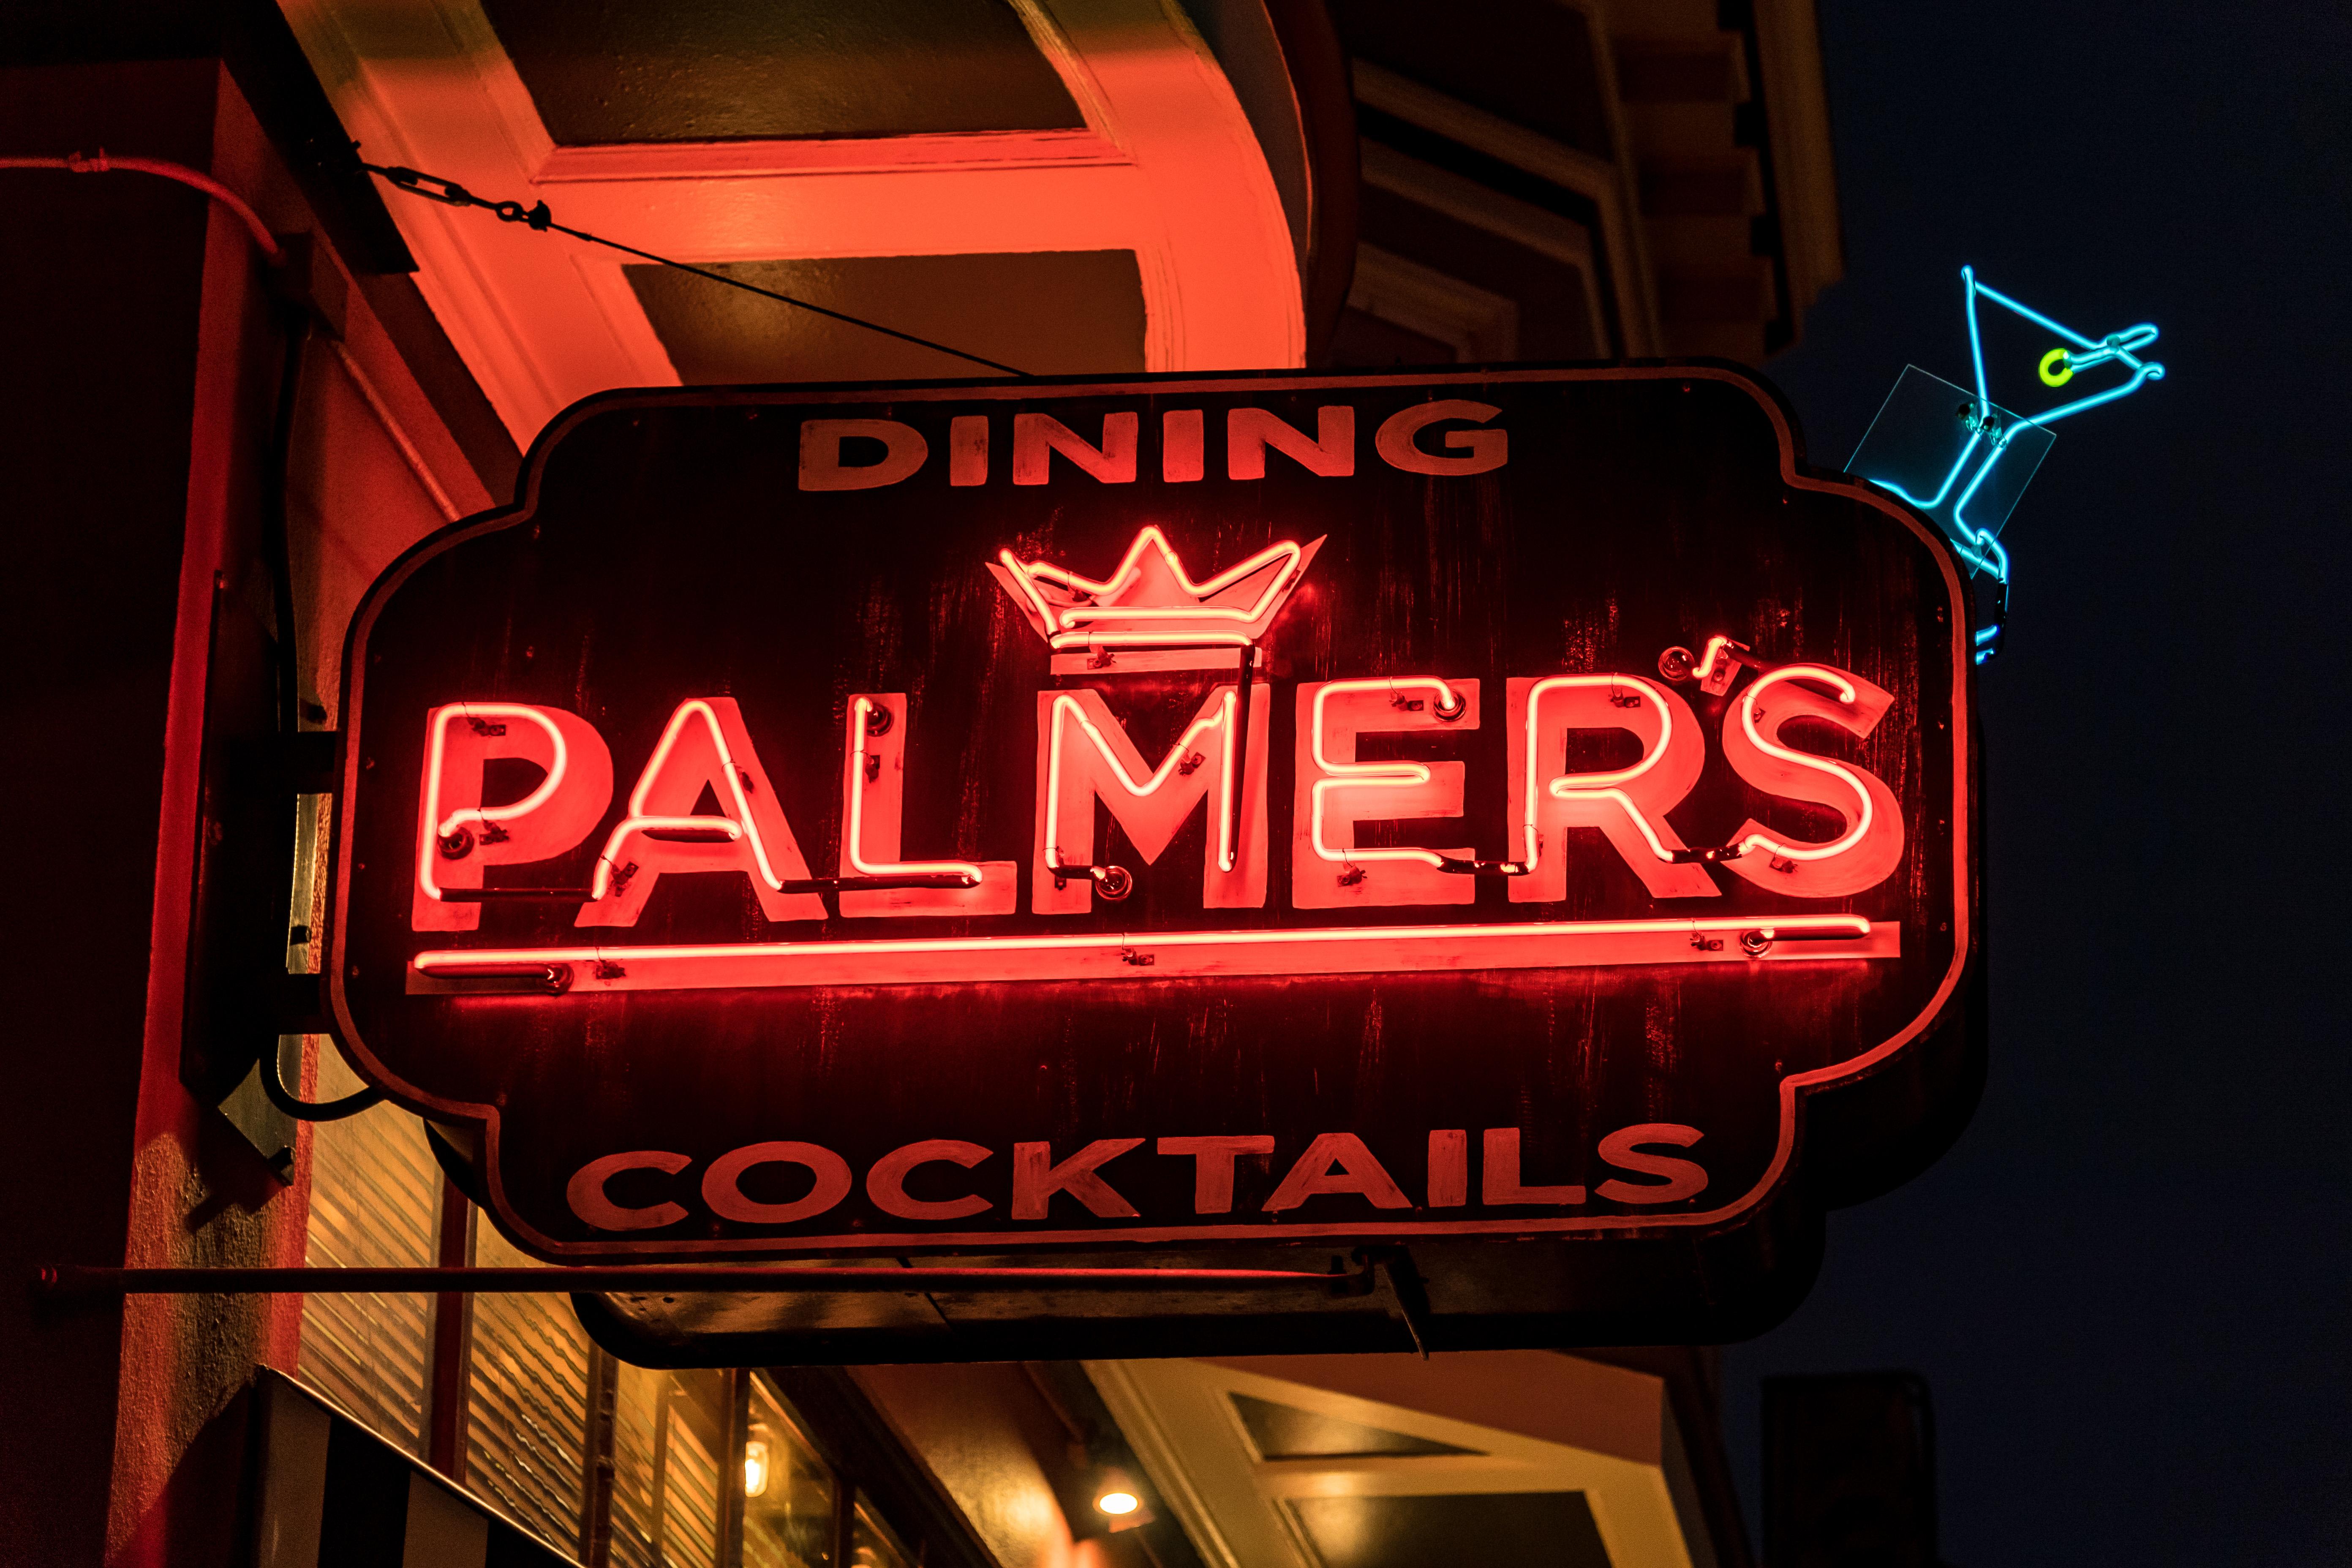 Palmer's Tavern - 2298 Fillmore Street, San Francisco, California U.S.A. - January 25, 2020